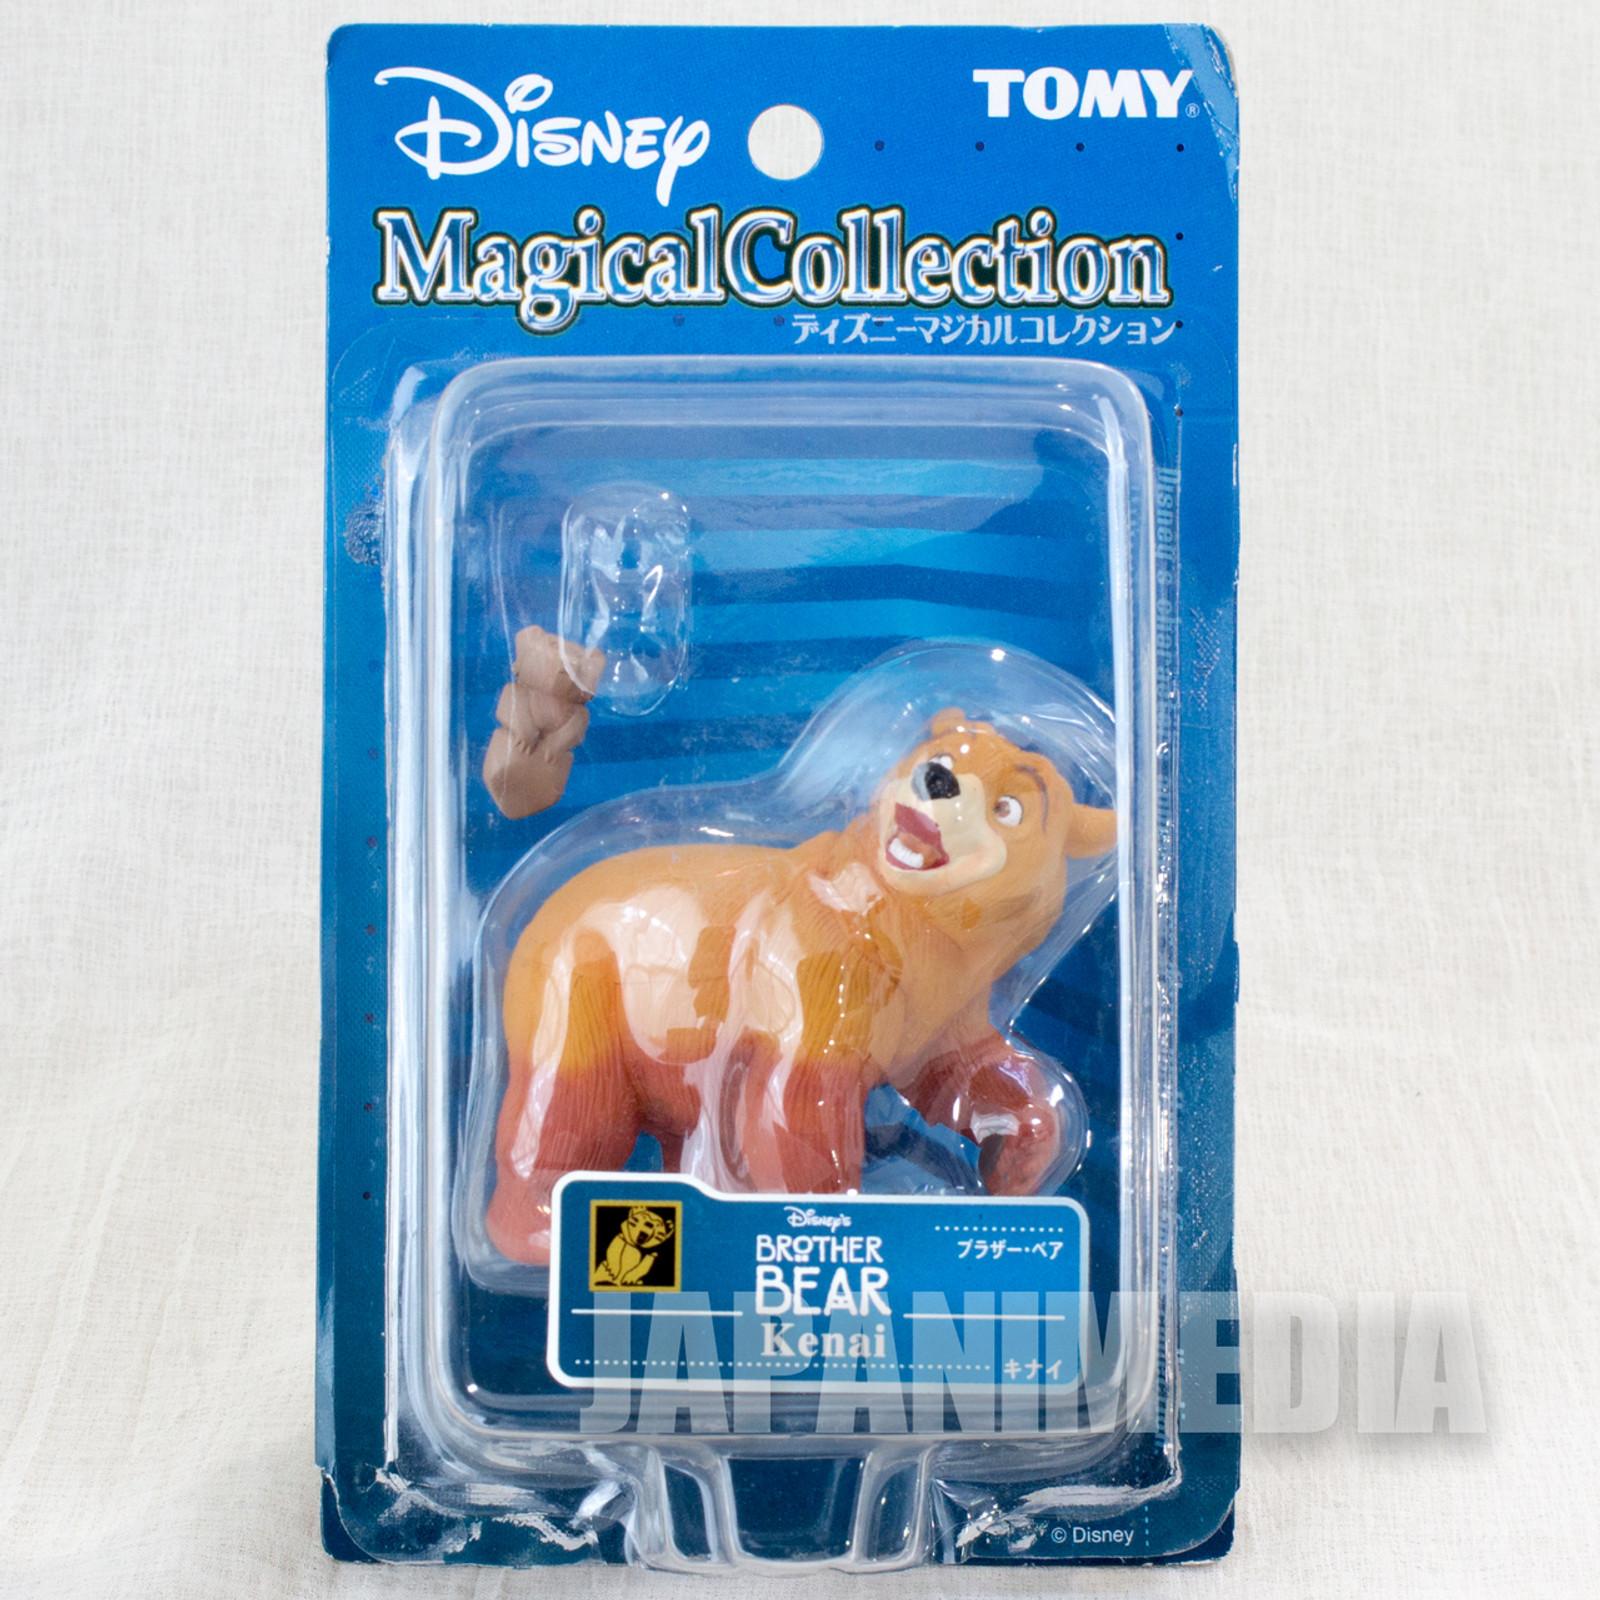 Brother Bear Kenai Disney Magical Collection Figure 104 Tomy ANIME